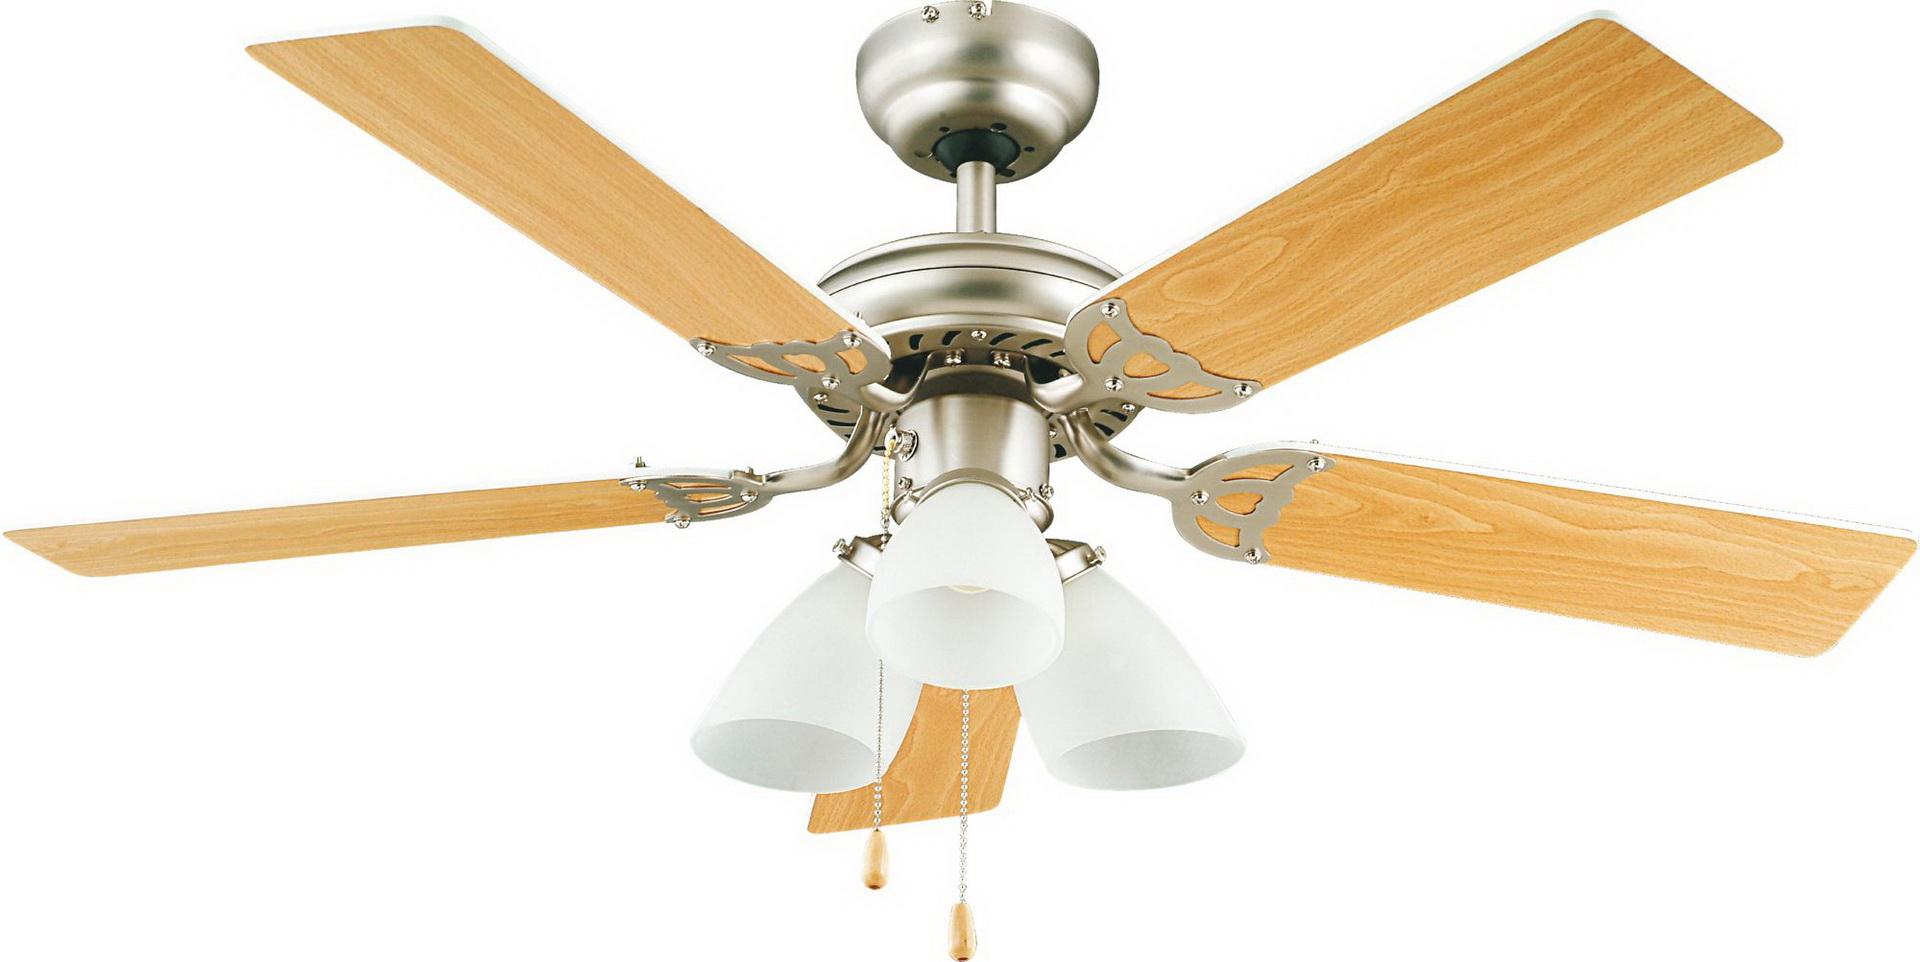 Ceiling fans with lights homebase nakedsnakepress ceiling fans with lights homebase snakepress com aloadofball Images